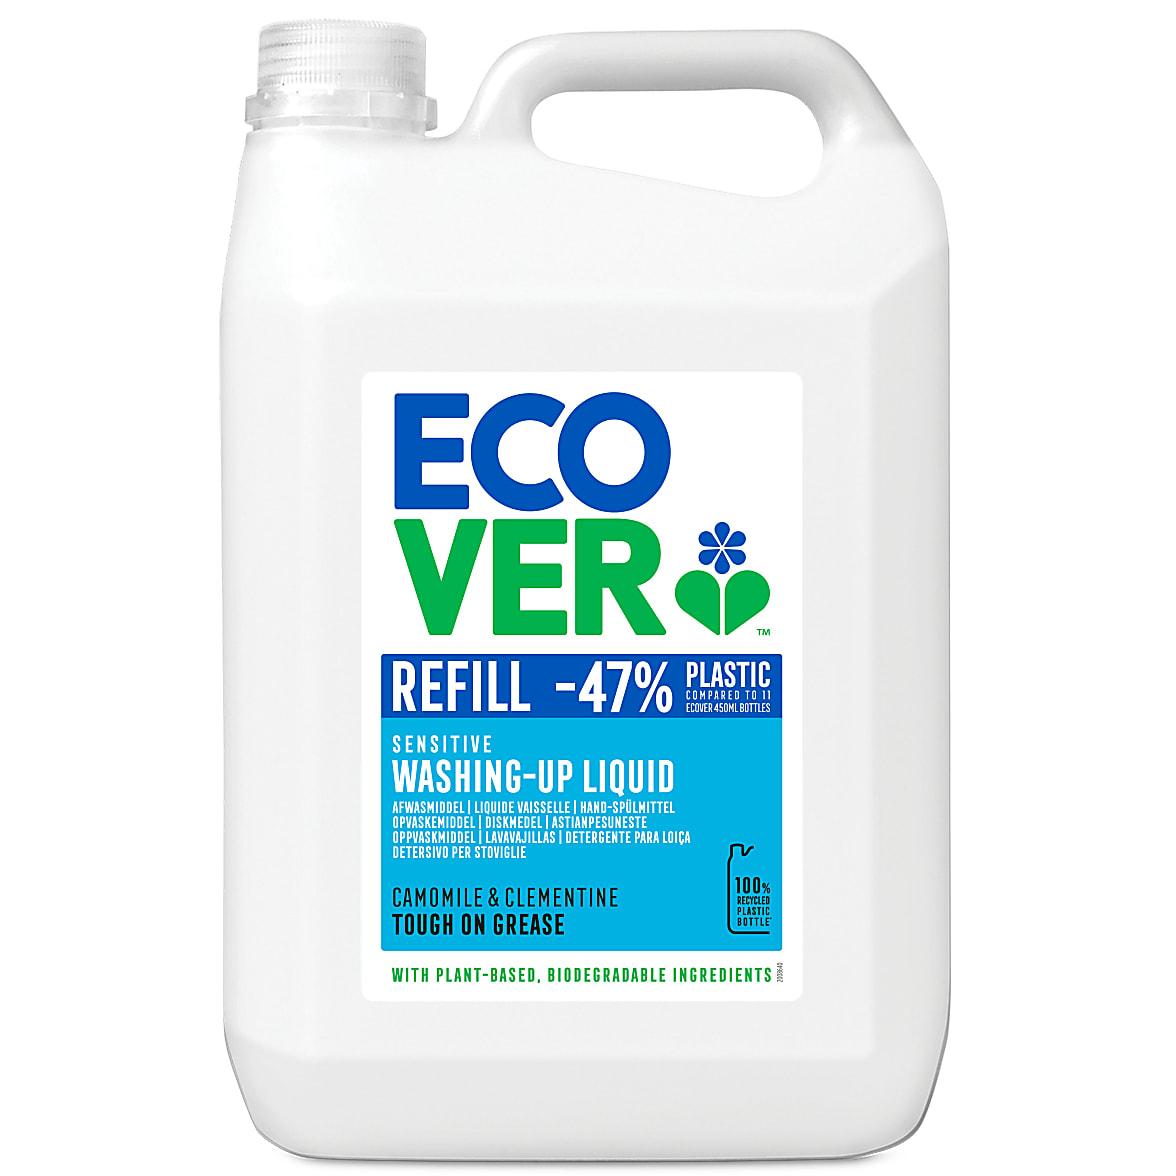 Ecover Eco Washing Up Liquid 5 Litre Camomile Marigold